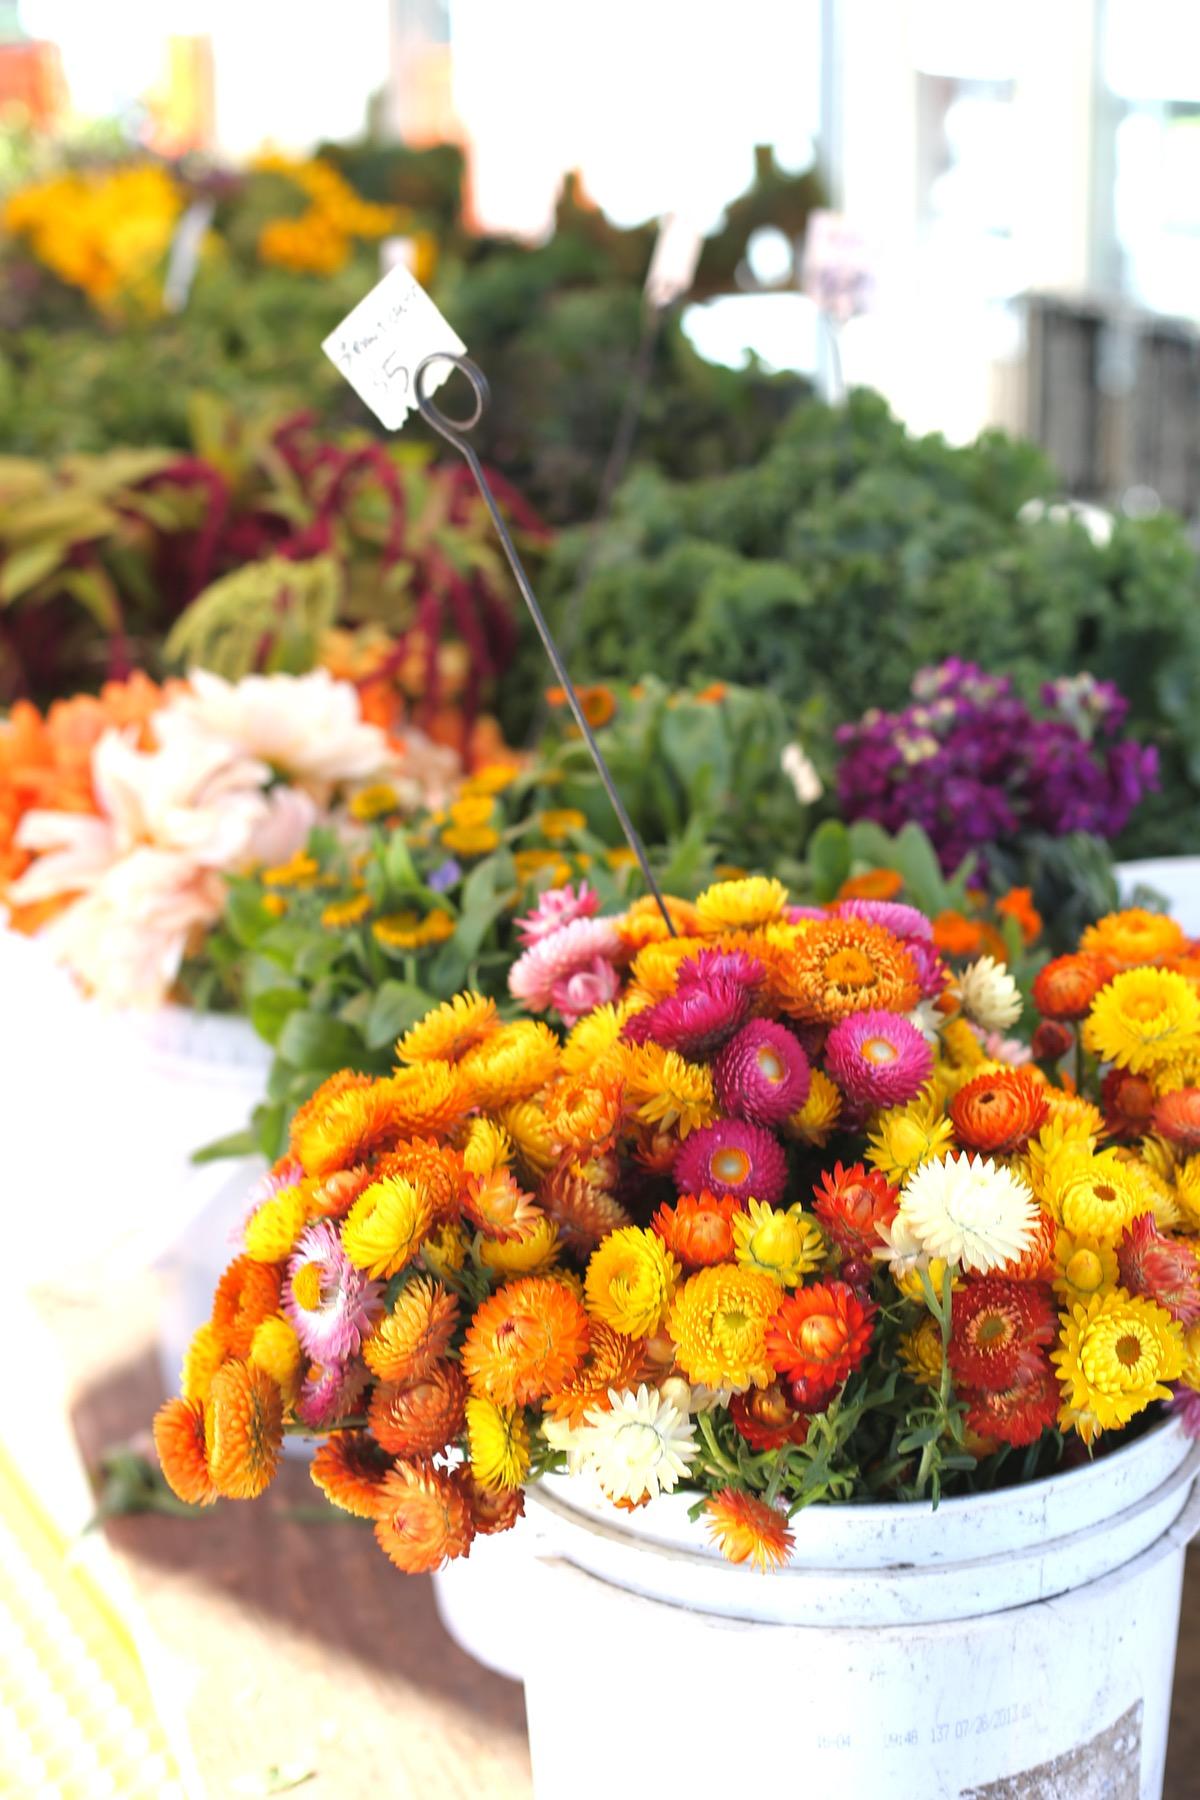 San Francisco Travel Ideas Ferry Buildling Farmer's Market - @mystylevita